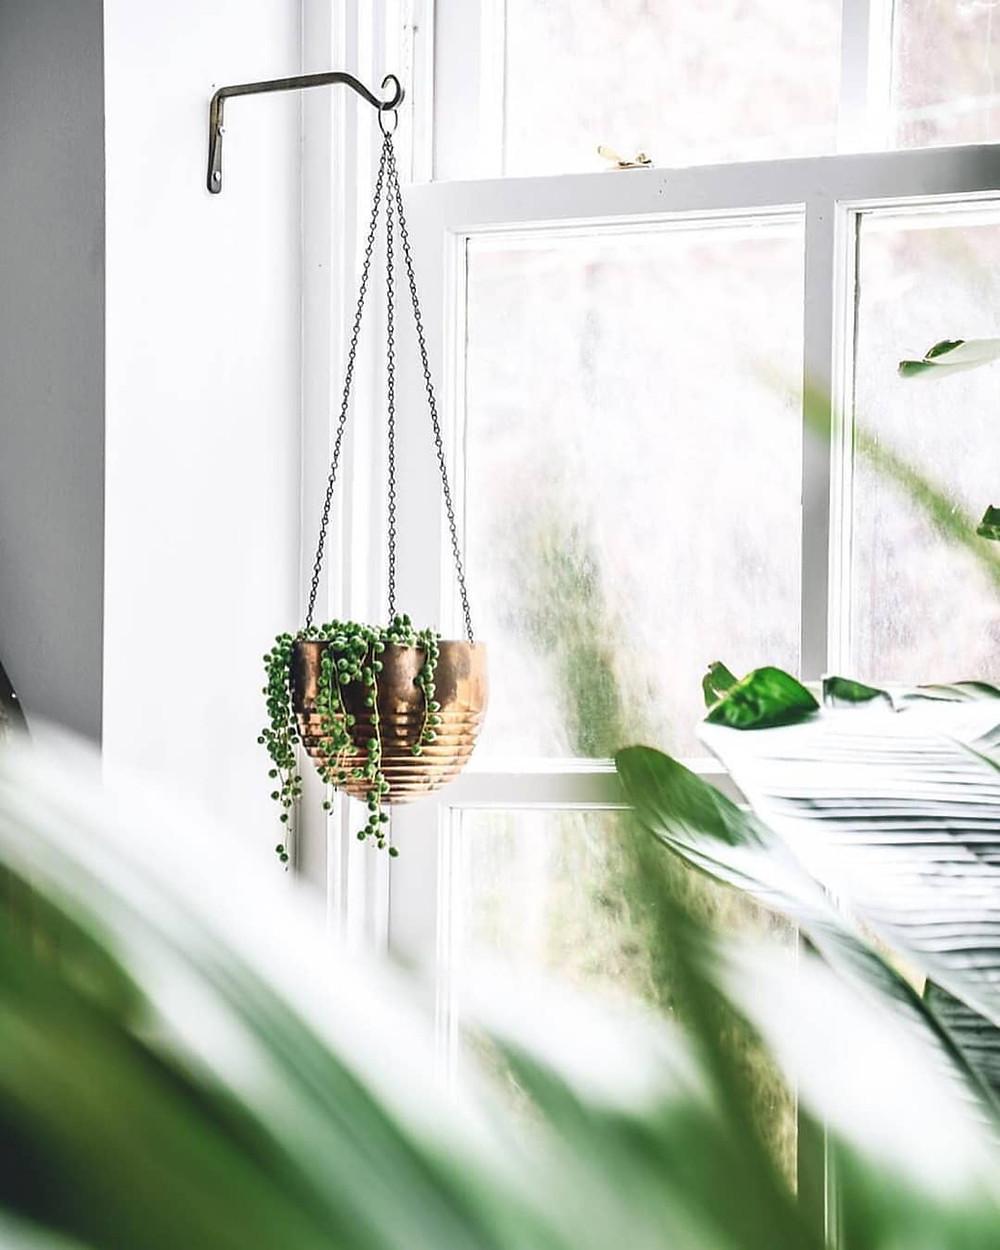 Senecio Rowleyanus String of Pearls Popular Trending Plant 2018